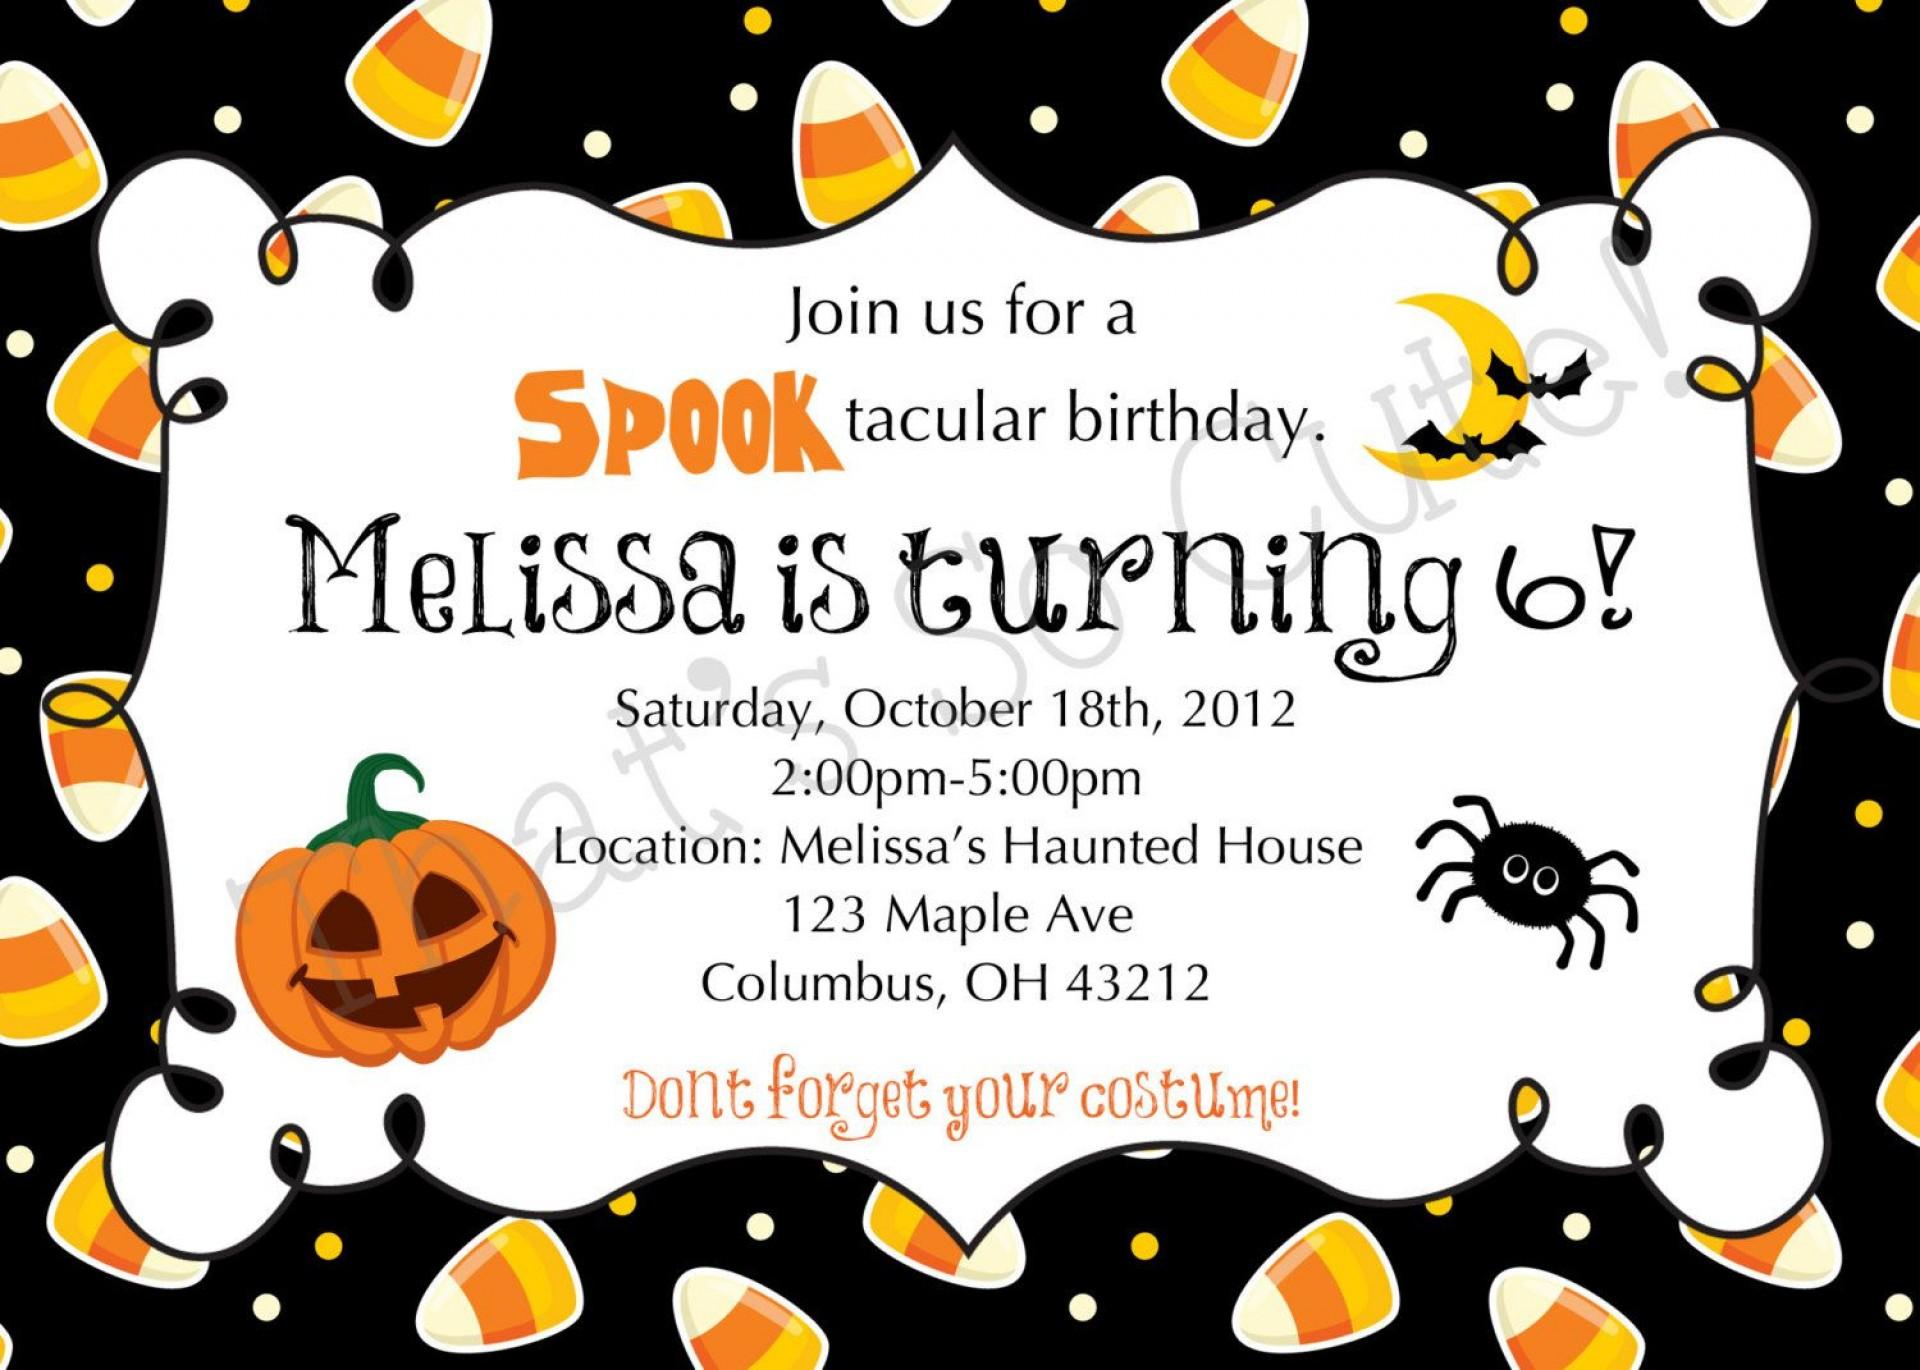 014 Impressive Free Halloween Invitation Template Example  Templates Microsoft Word Wedding Printable Party1920